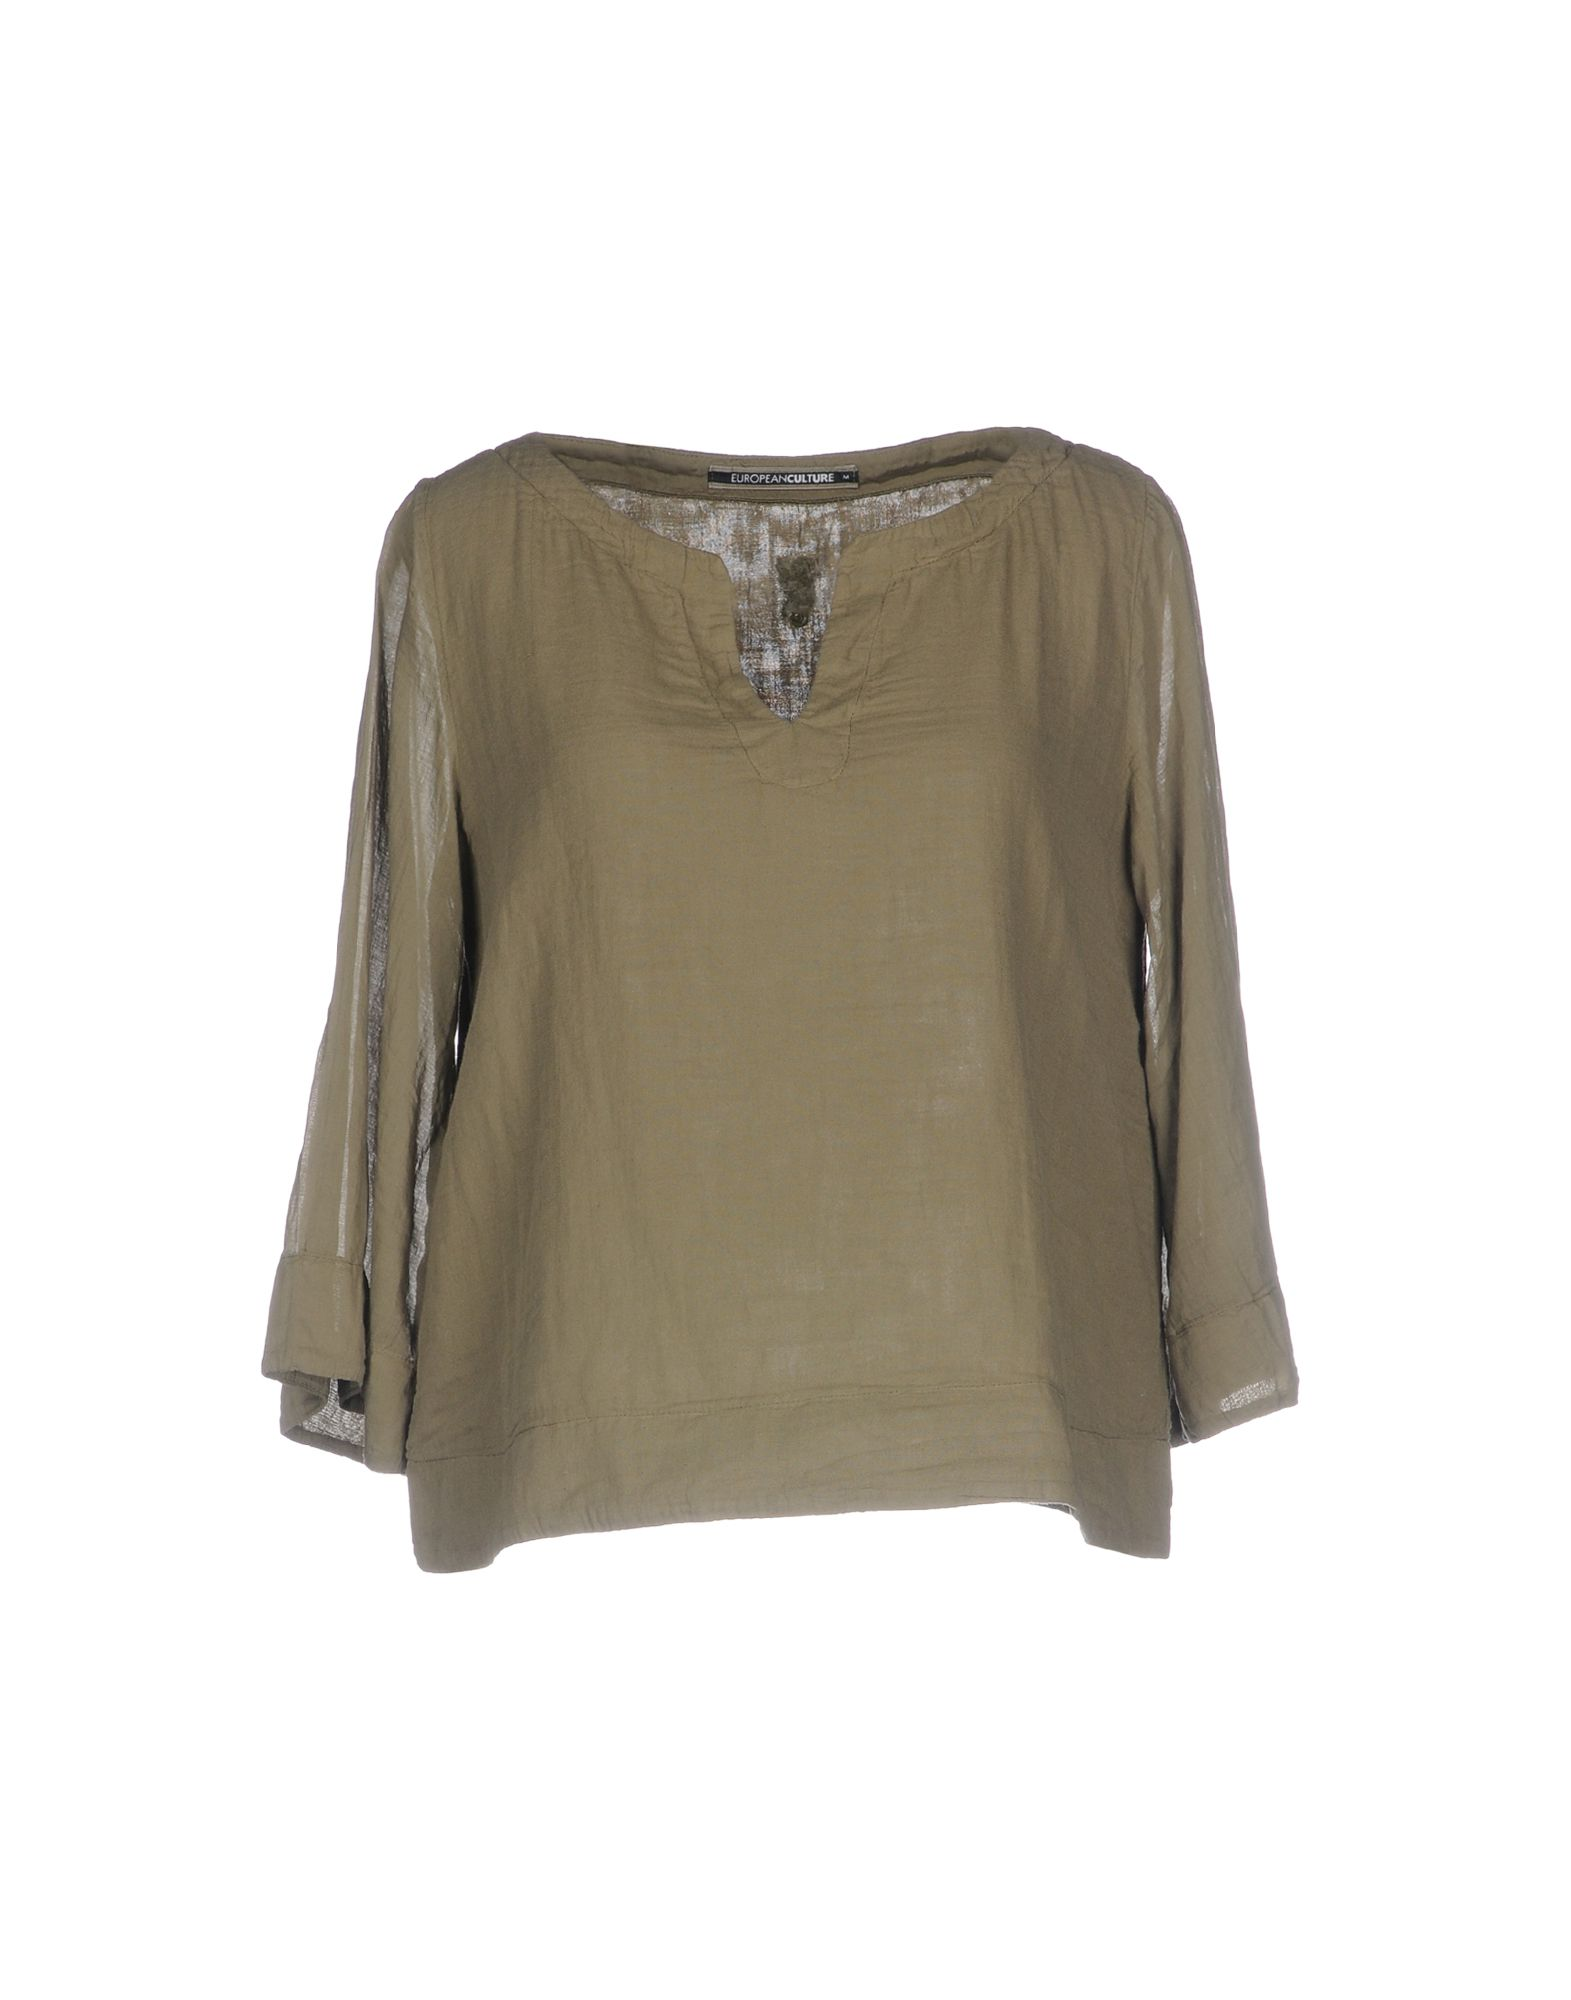 EUROPEAN CULTURE Damen Bluse Farbe Militärgrün Größe 6